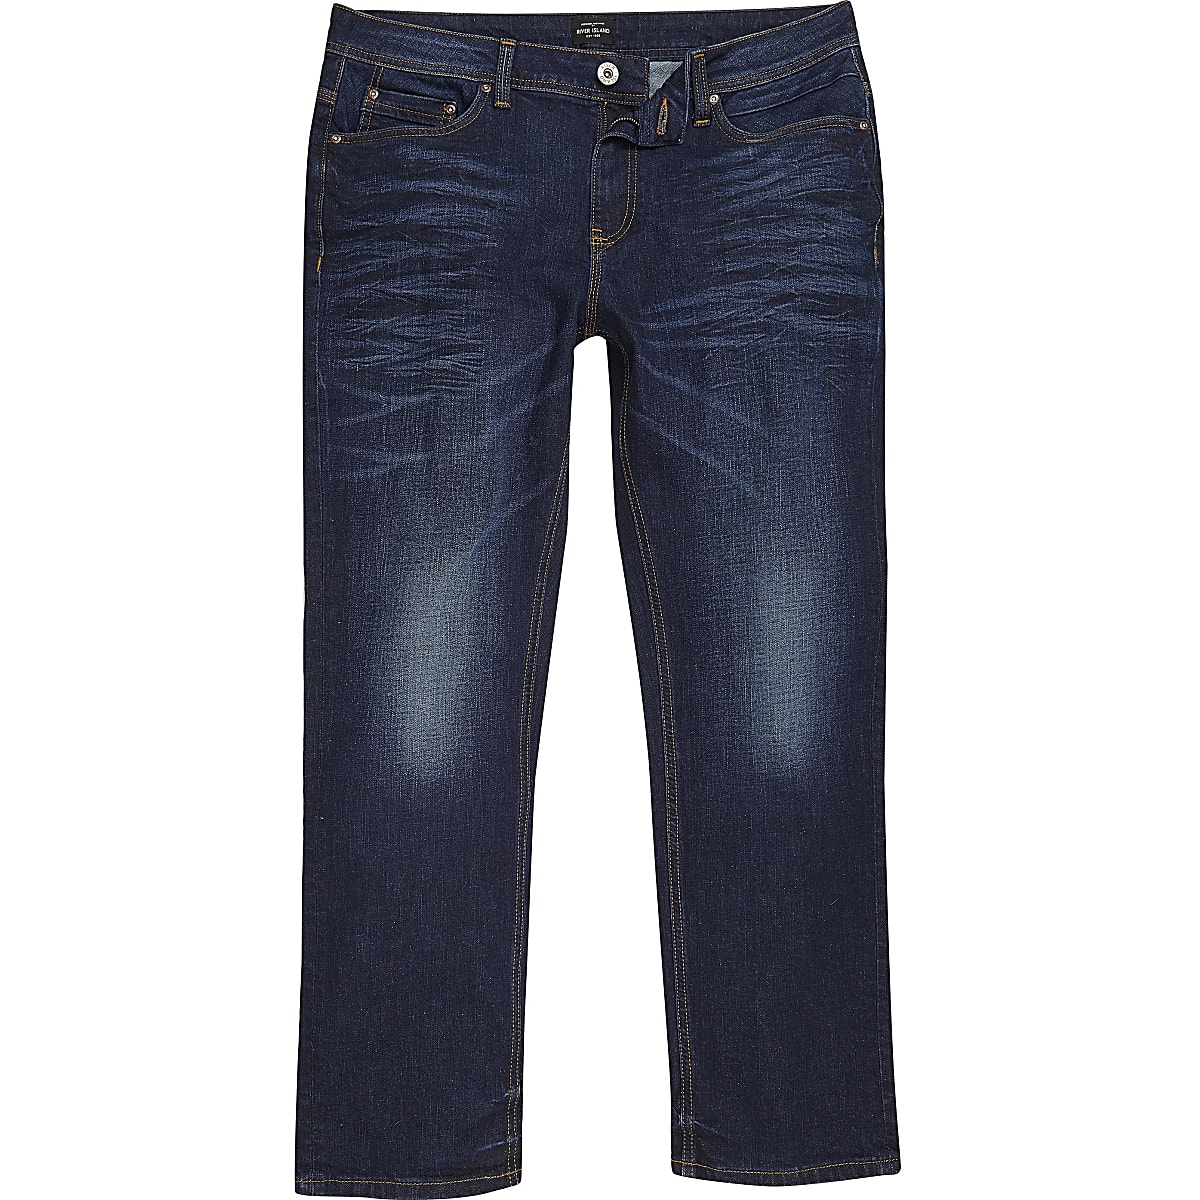 Big and Tall dark blue Clint bootcut jeans